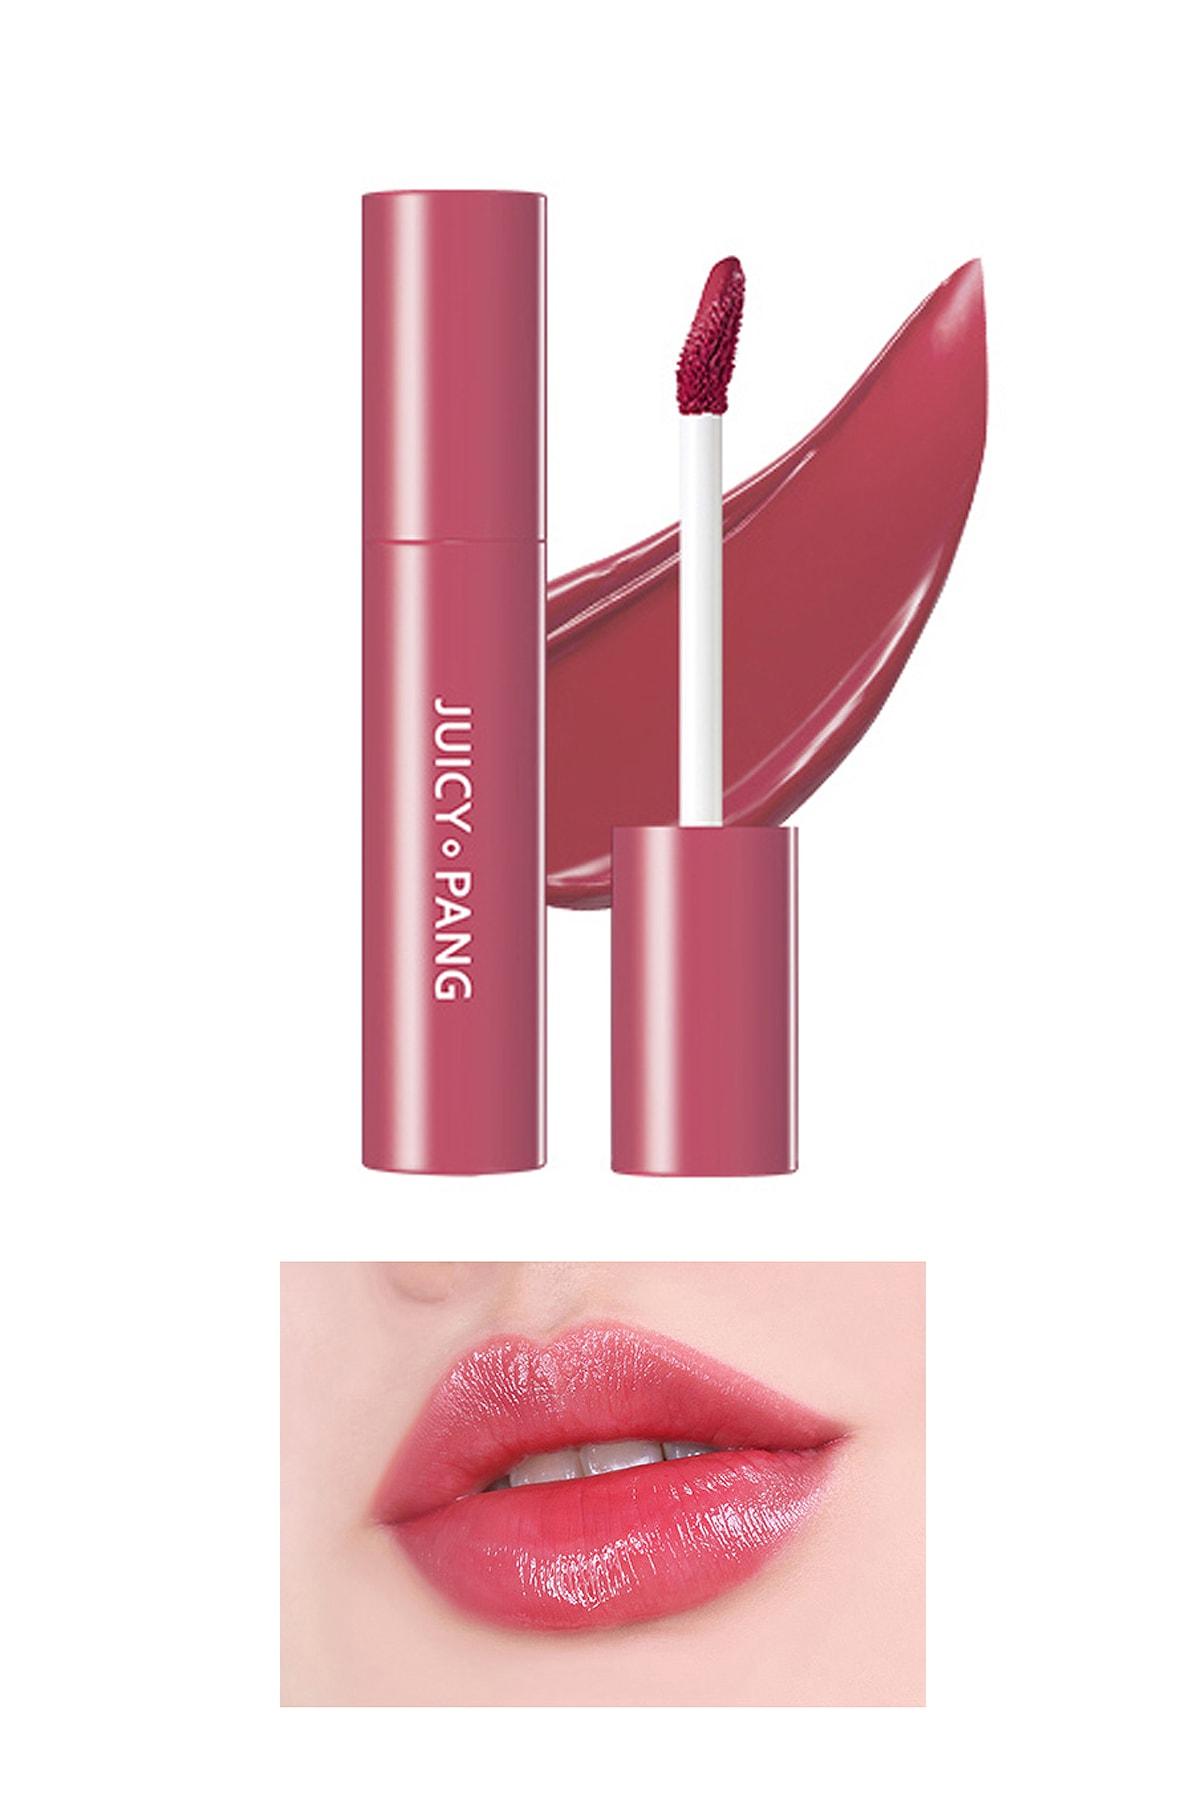 Missha Uzun Süre Kalıcı Parlak Su Bazlı Jel Tint  APIEU Juicy-Pang Sugar Tint (PK02)